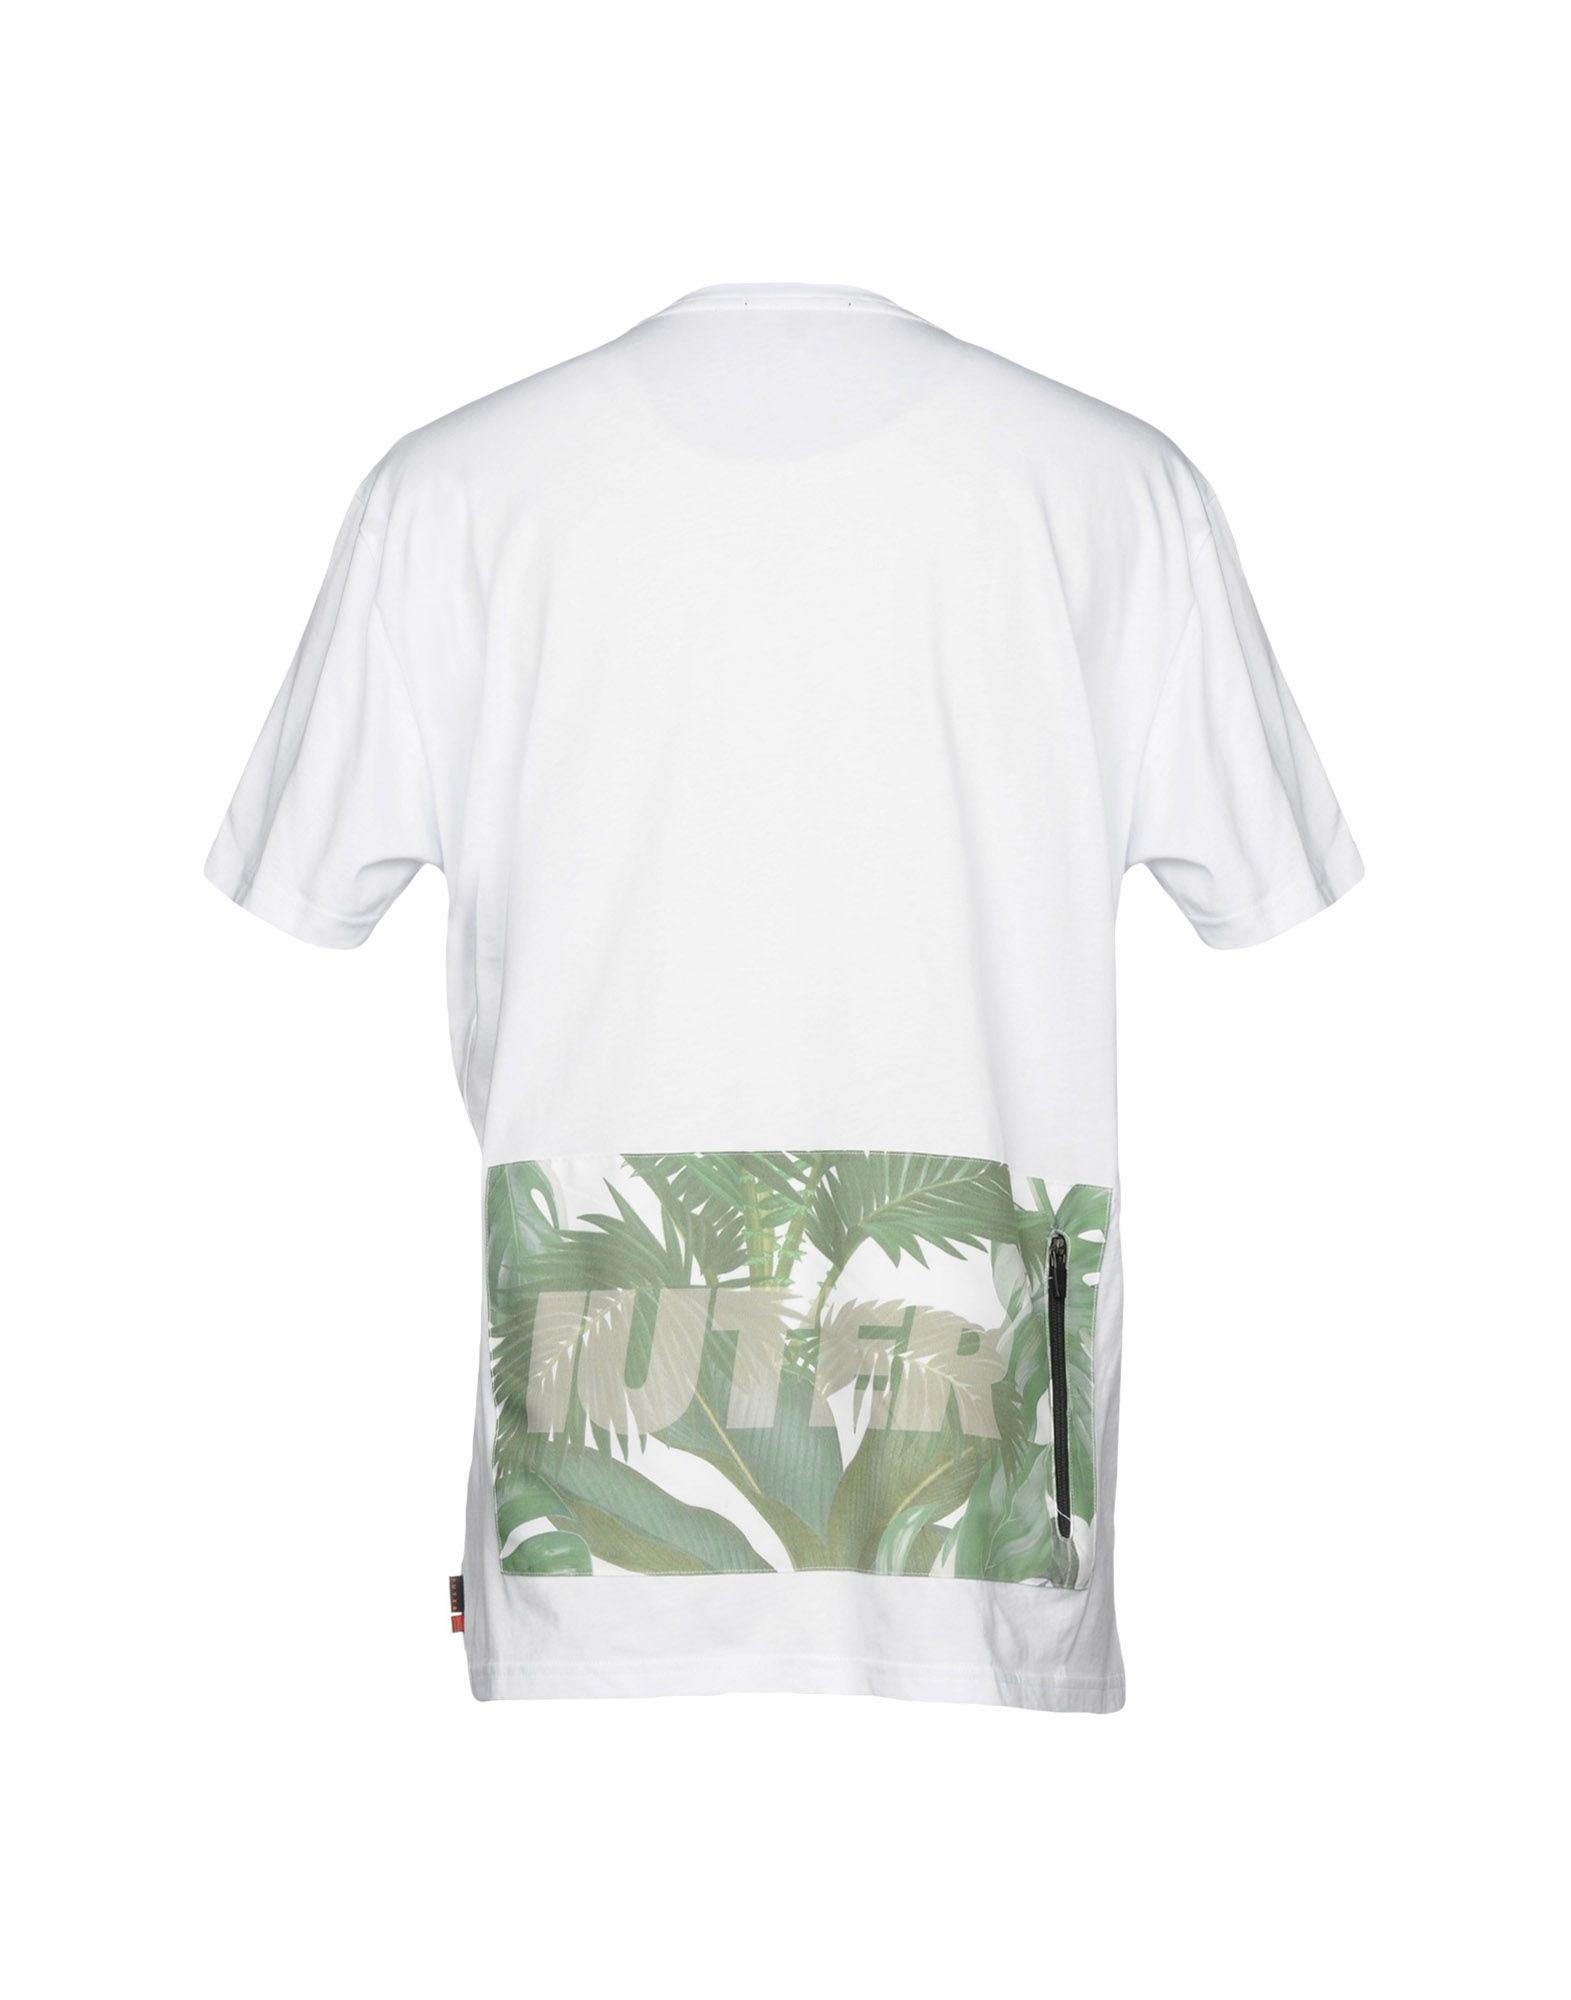 A buon mercato A buon mercato Iuter T-Shirt Iuter mercato Uomo - 12134218FO 1f52a8